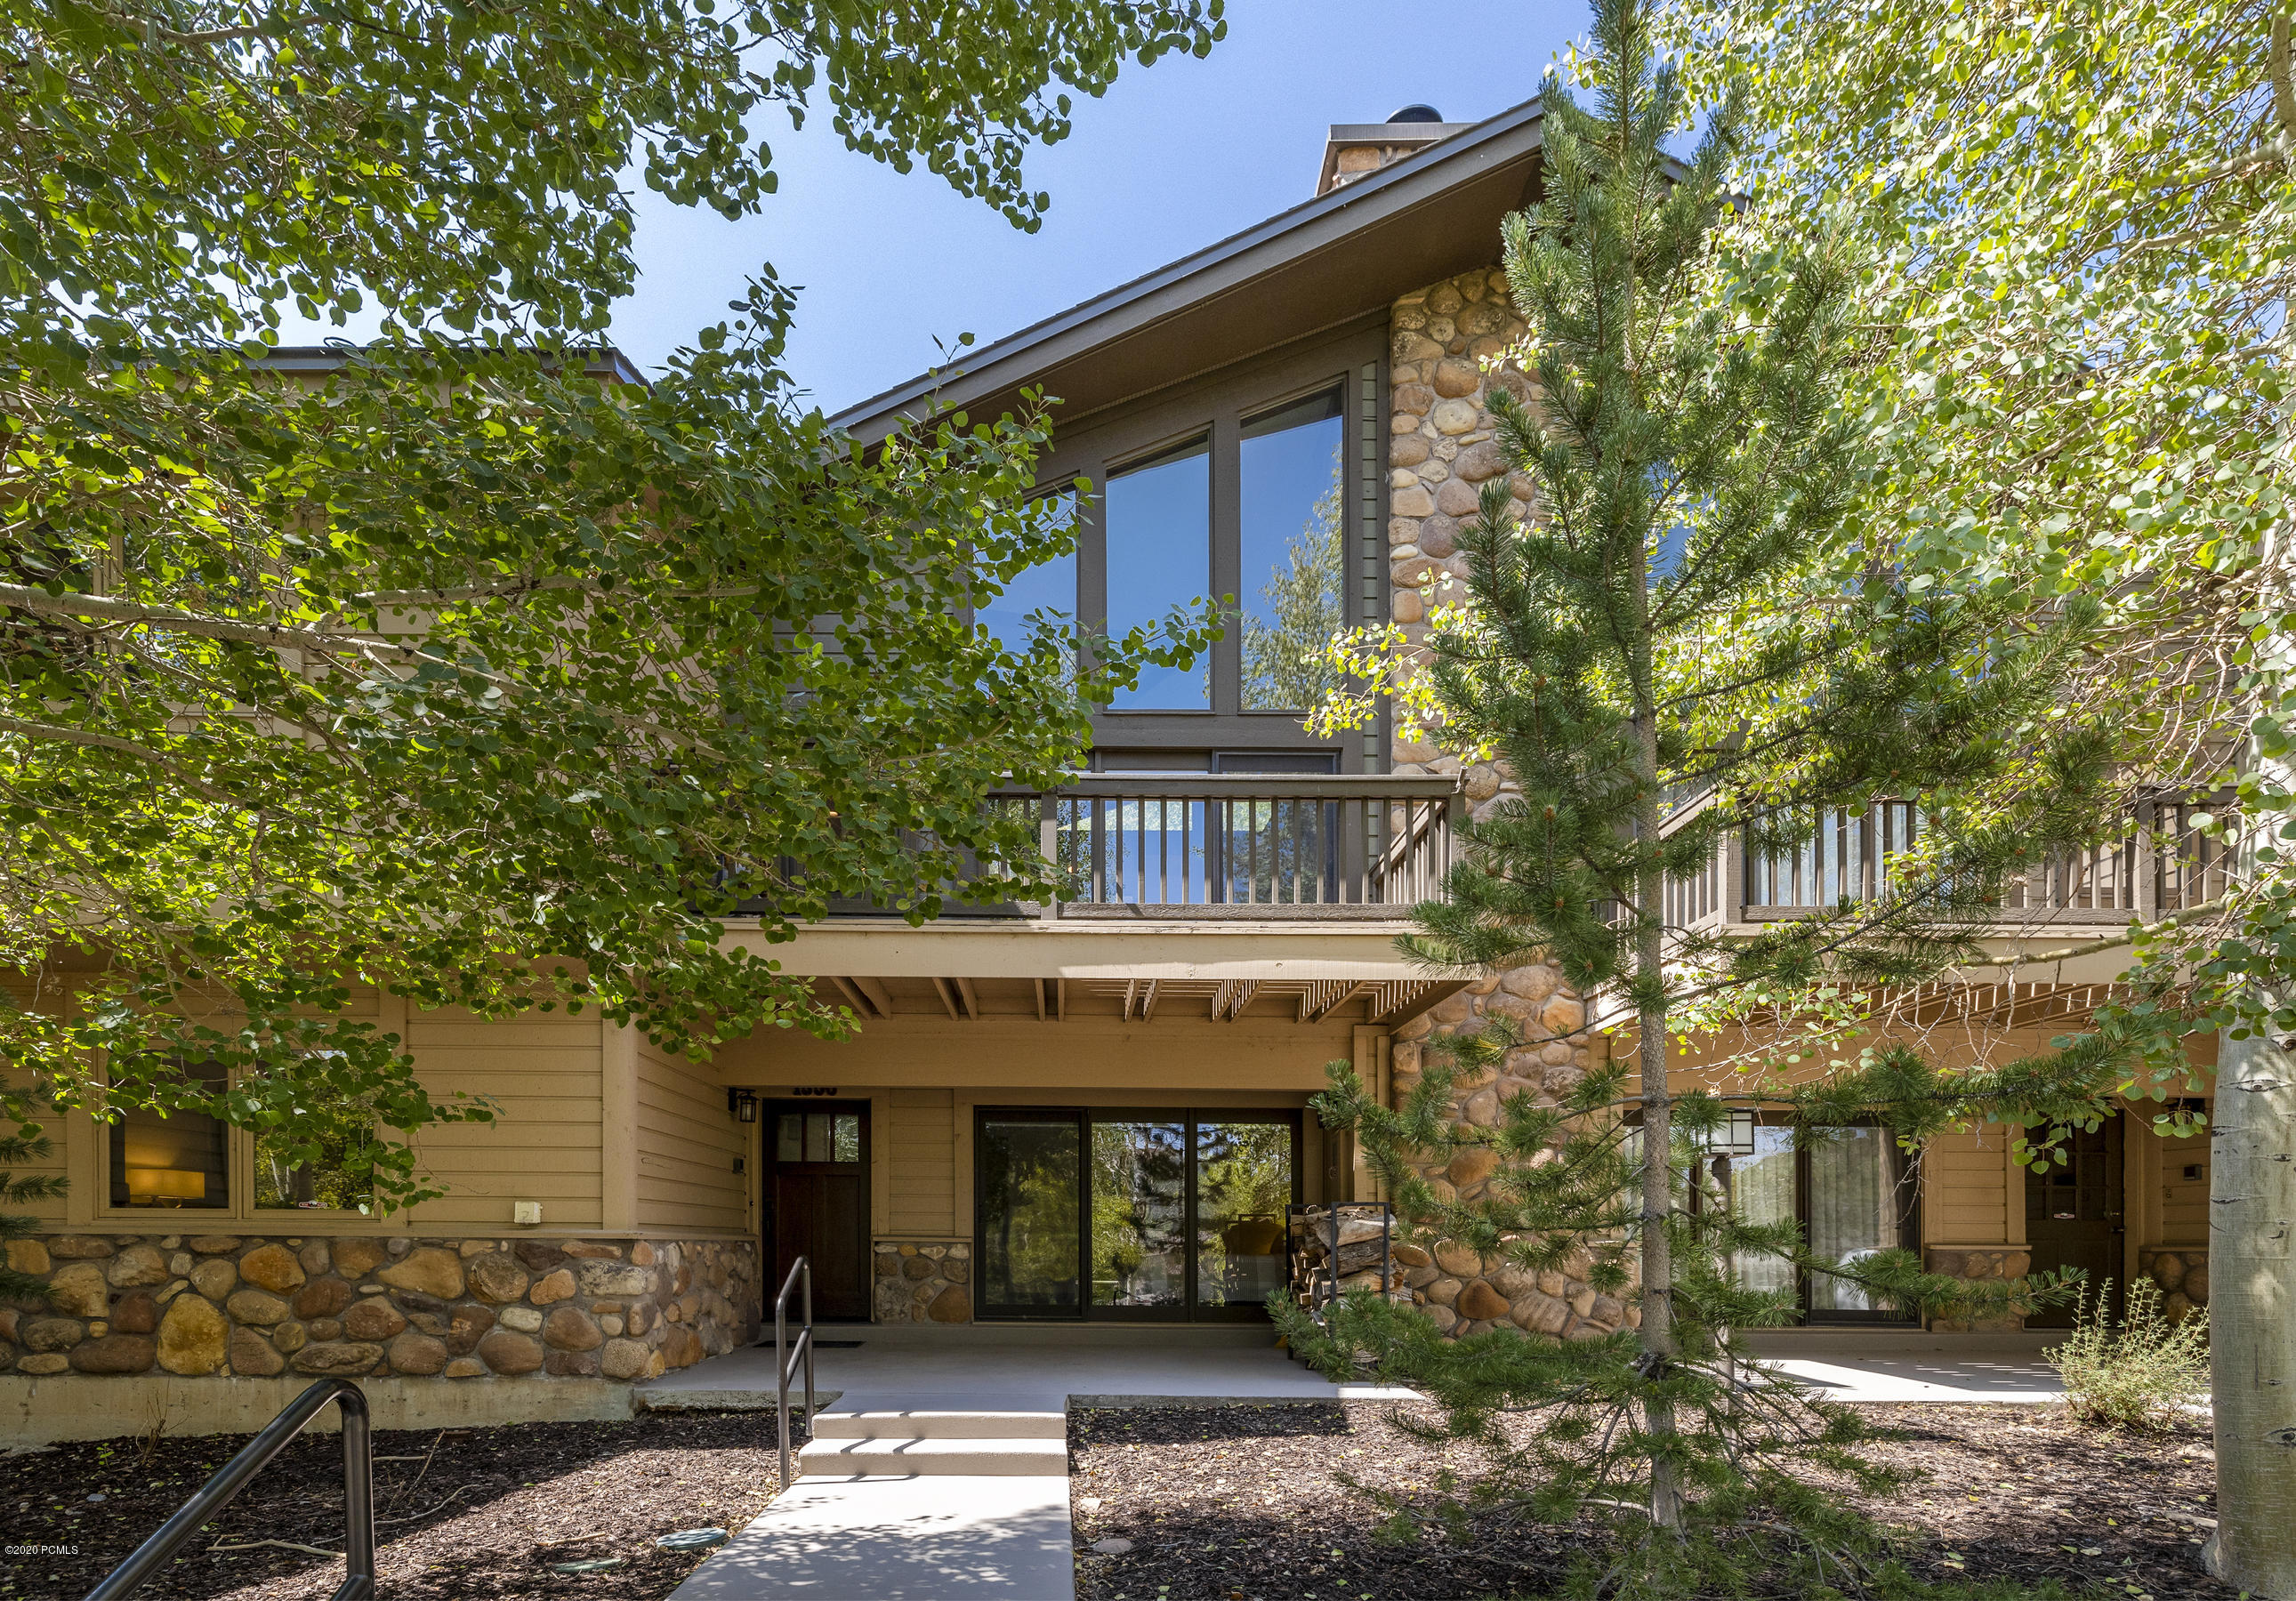 1550 Deer Valley Drive, Park City, Utah 84060, 3 Bedrooms Bedrooms, ,3 BathroomsBathrooms,Condominium,For Sale,Deer Valley,12002853